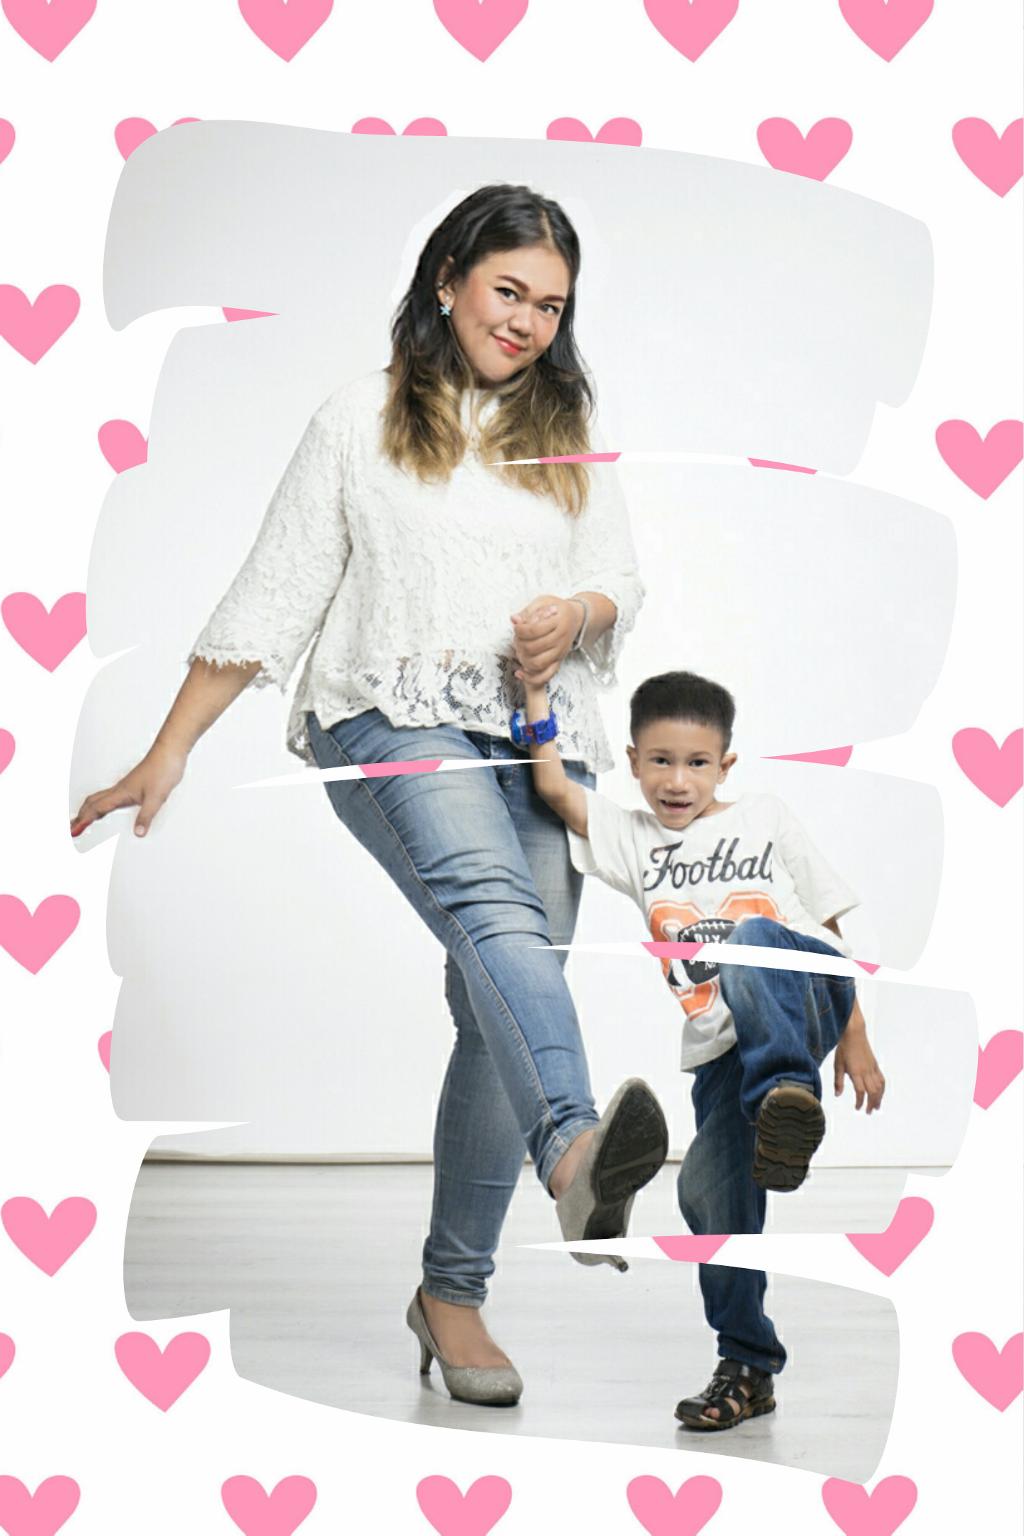 #mommysboy #mother #love #eternal